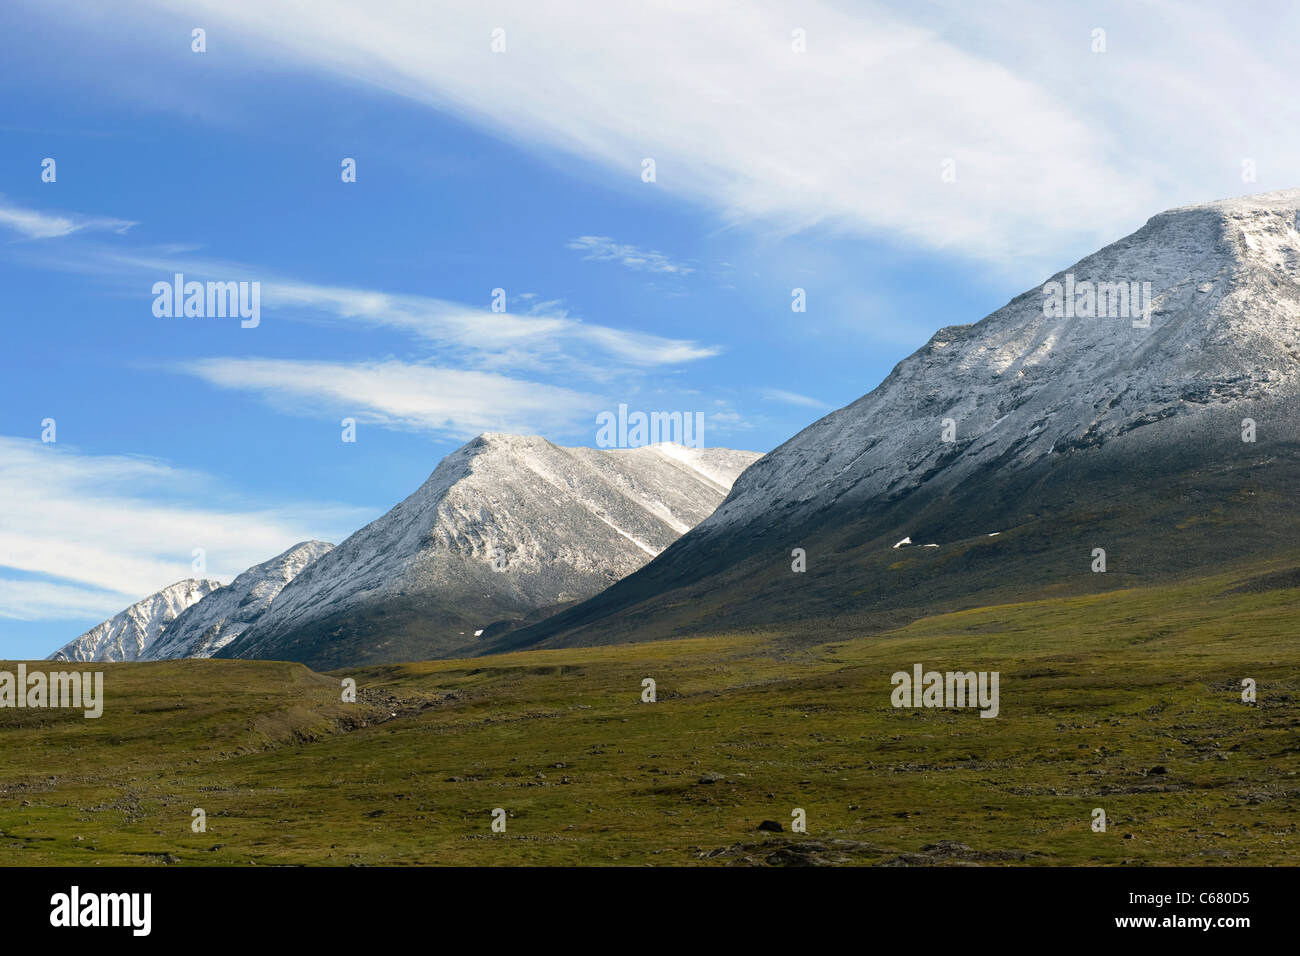 Lapland landscape along Kungsleden hiking path (The King's Trail) in northern Sweden - Stock Image